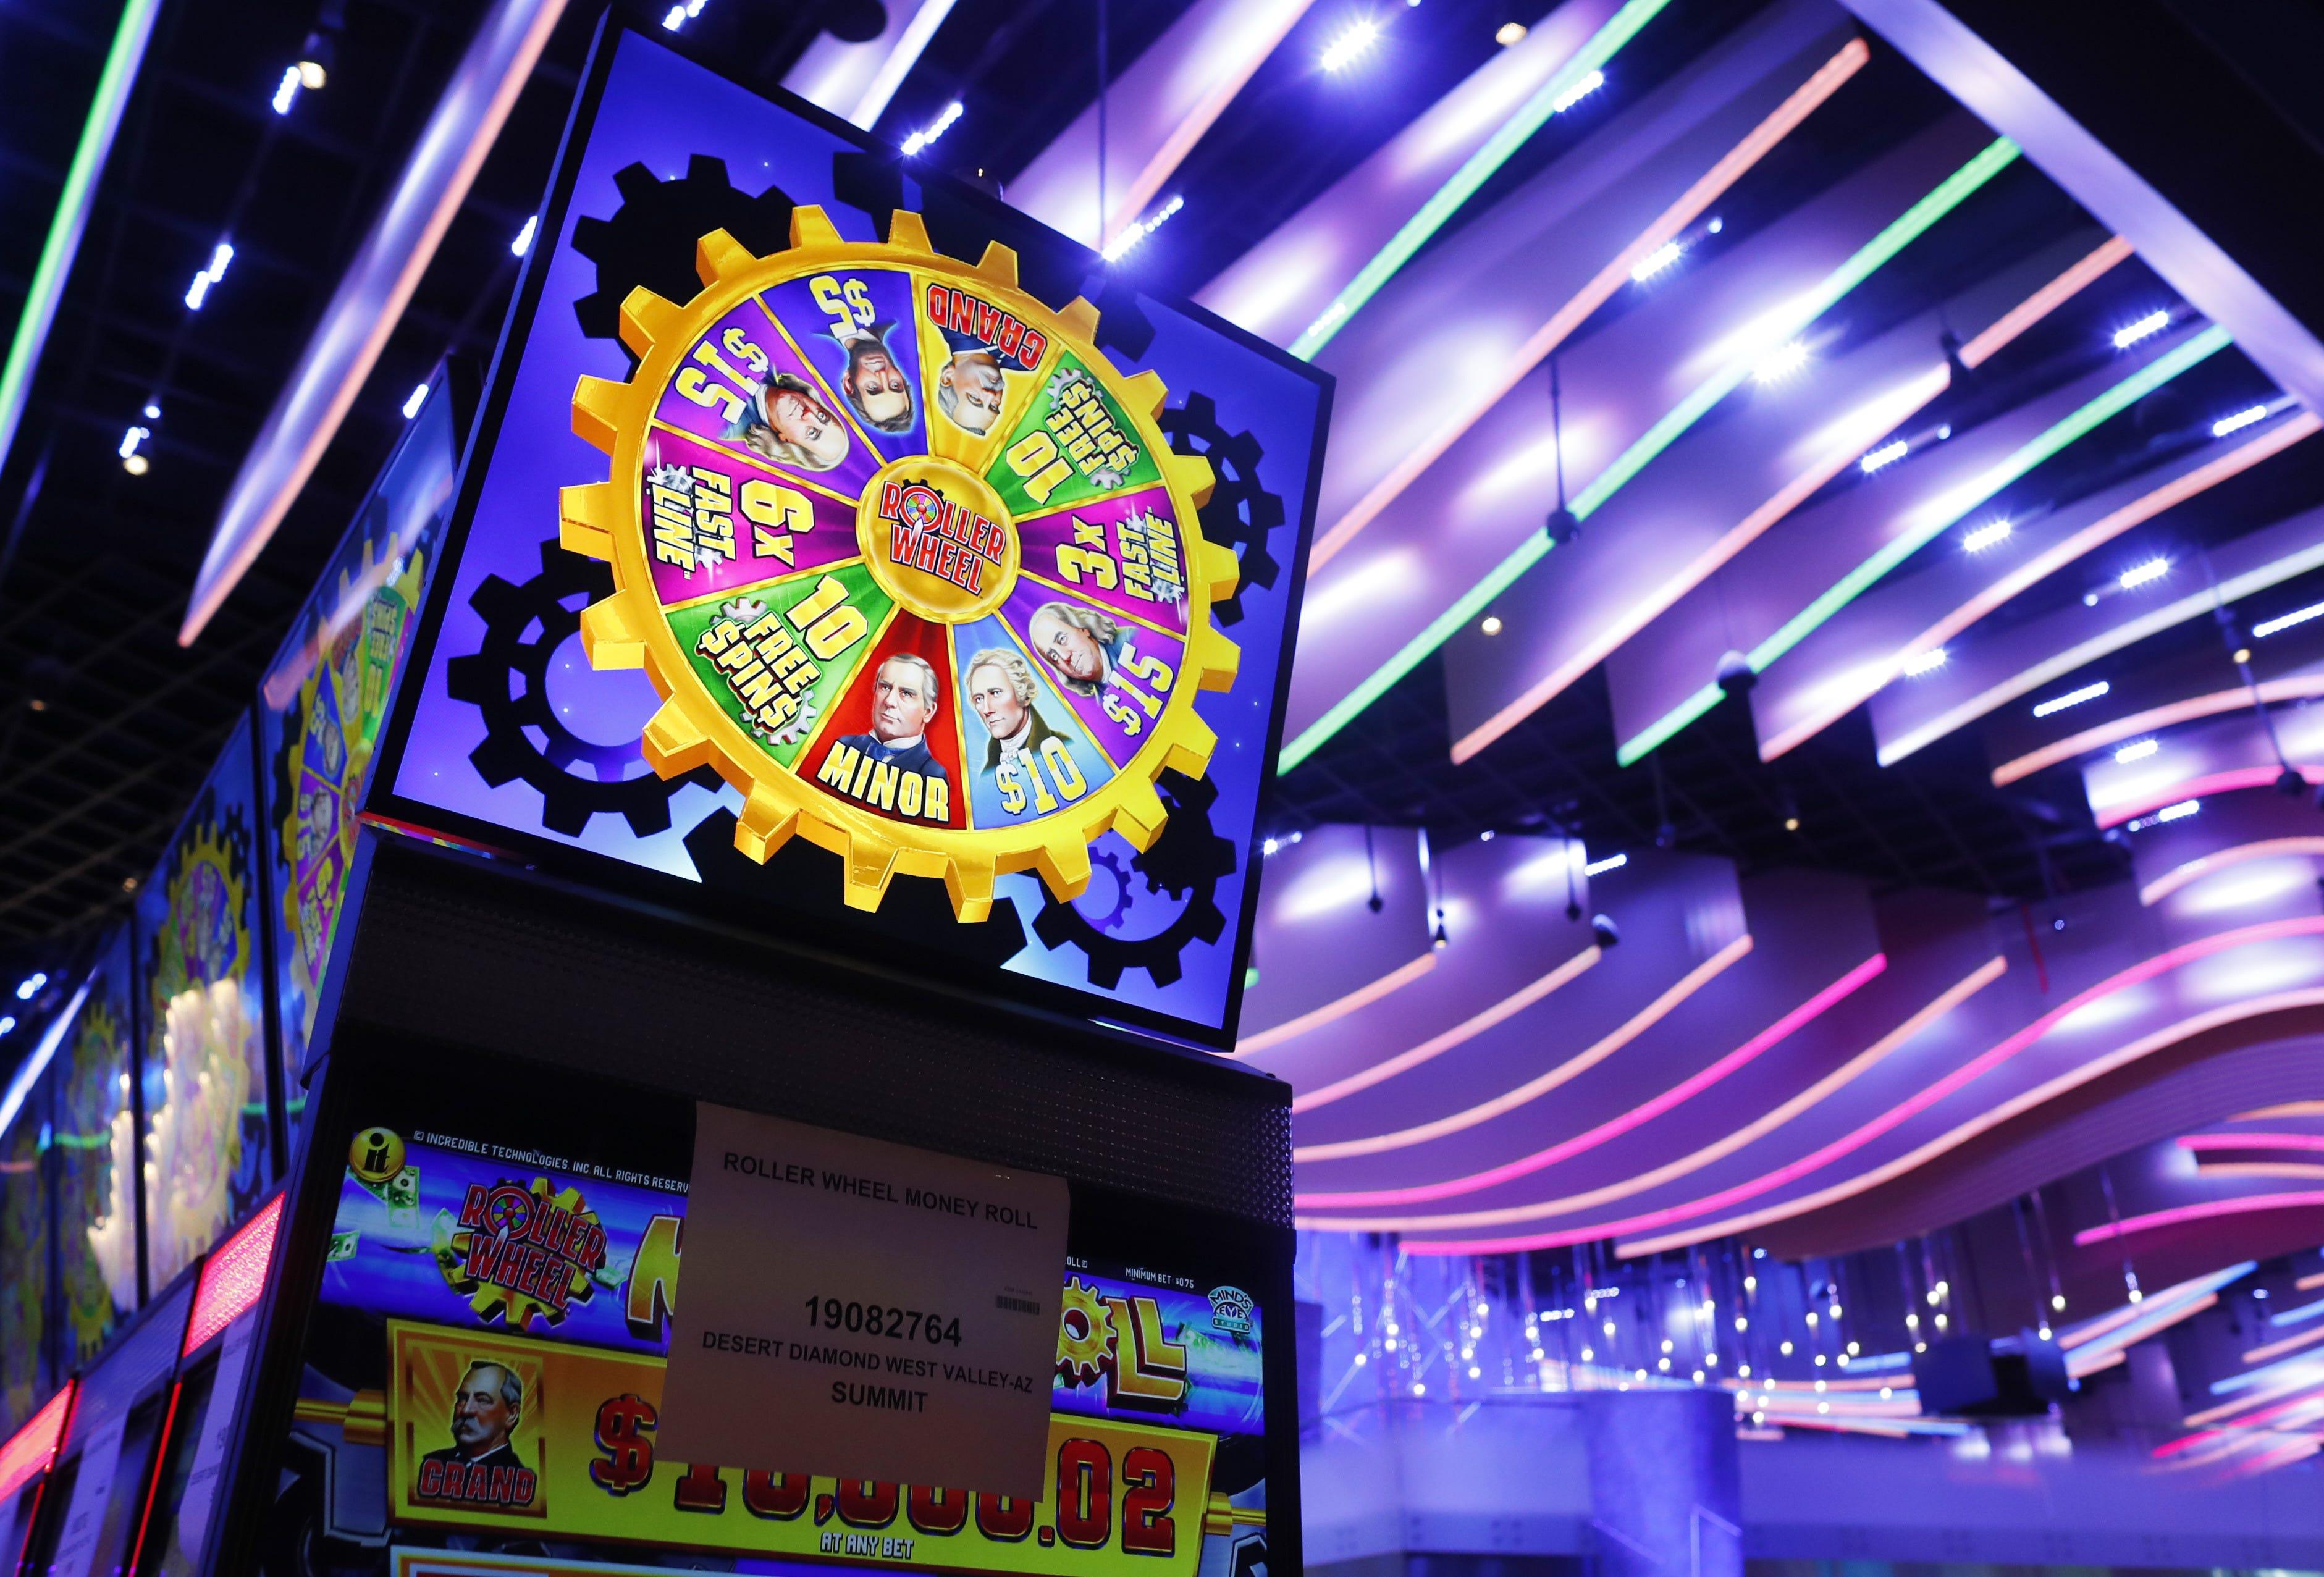 Desert Diamond Casino West Valley opens this week....